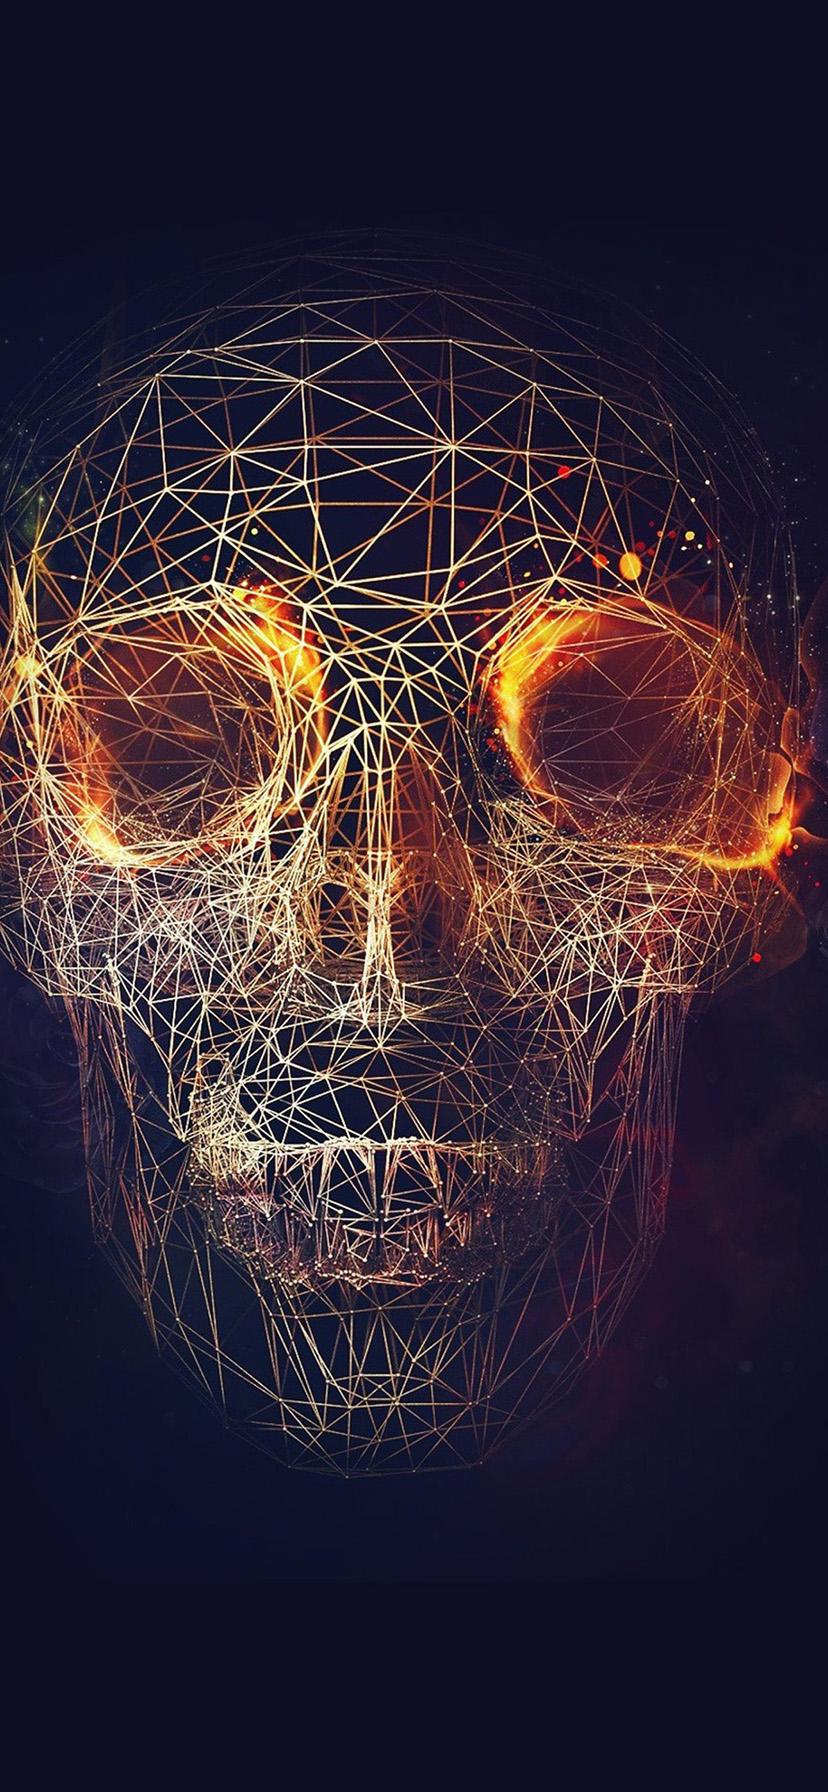 16 168196 digital skull art iphone xr wallpaper 3d wallpaper